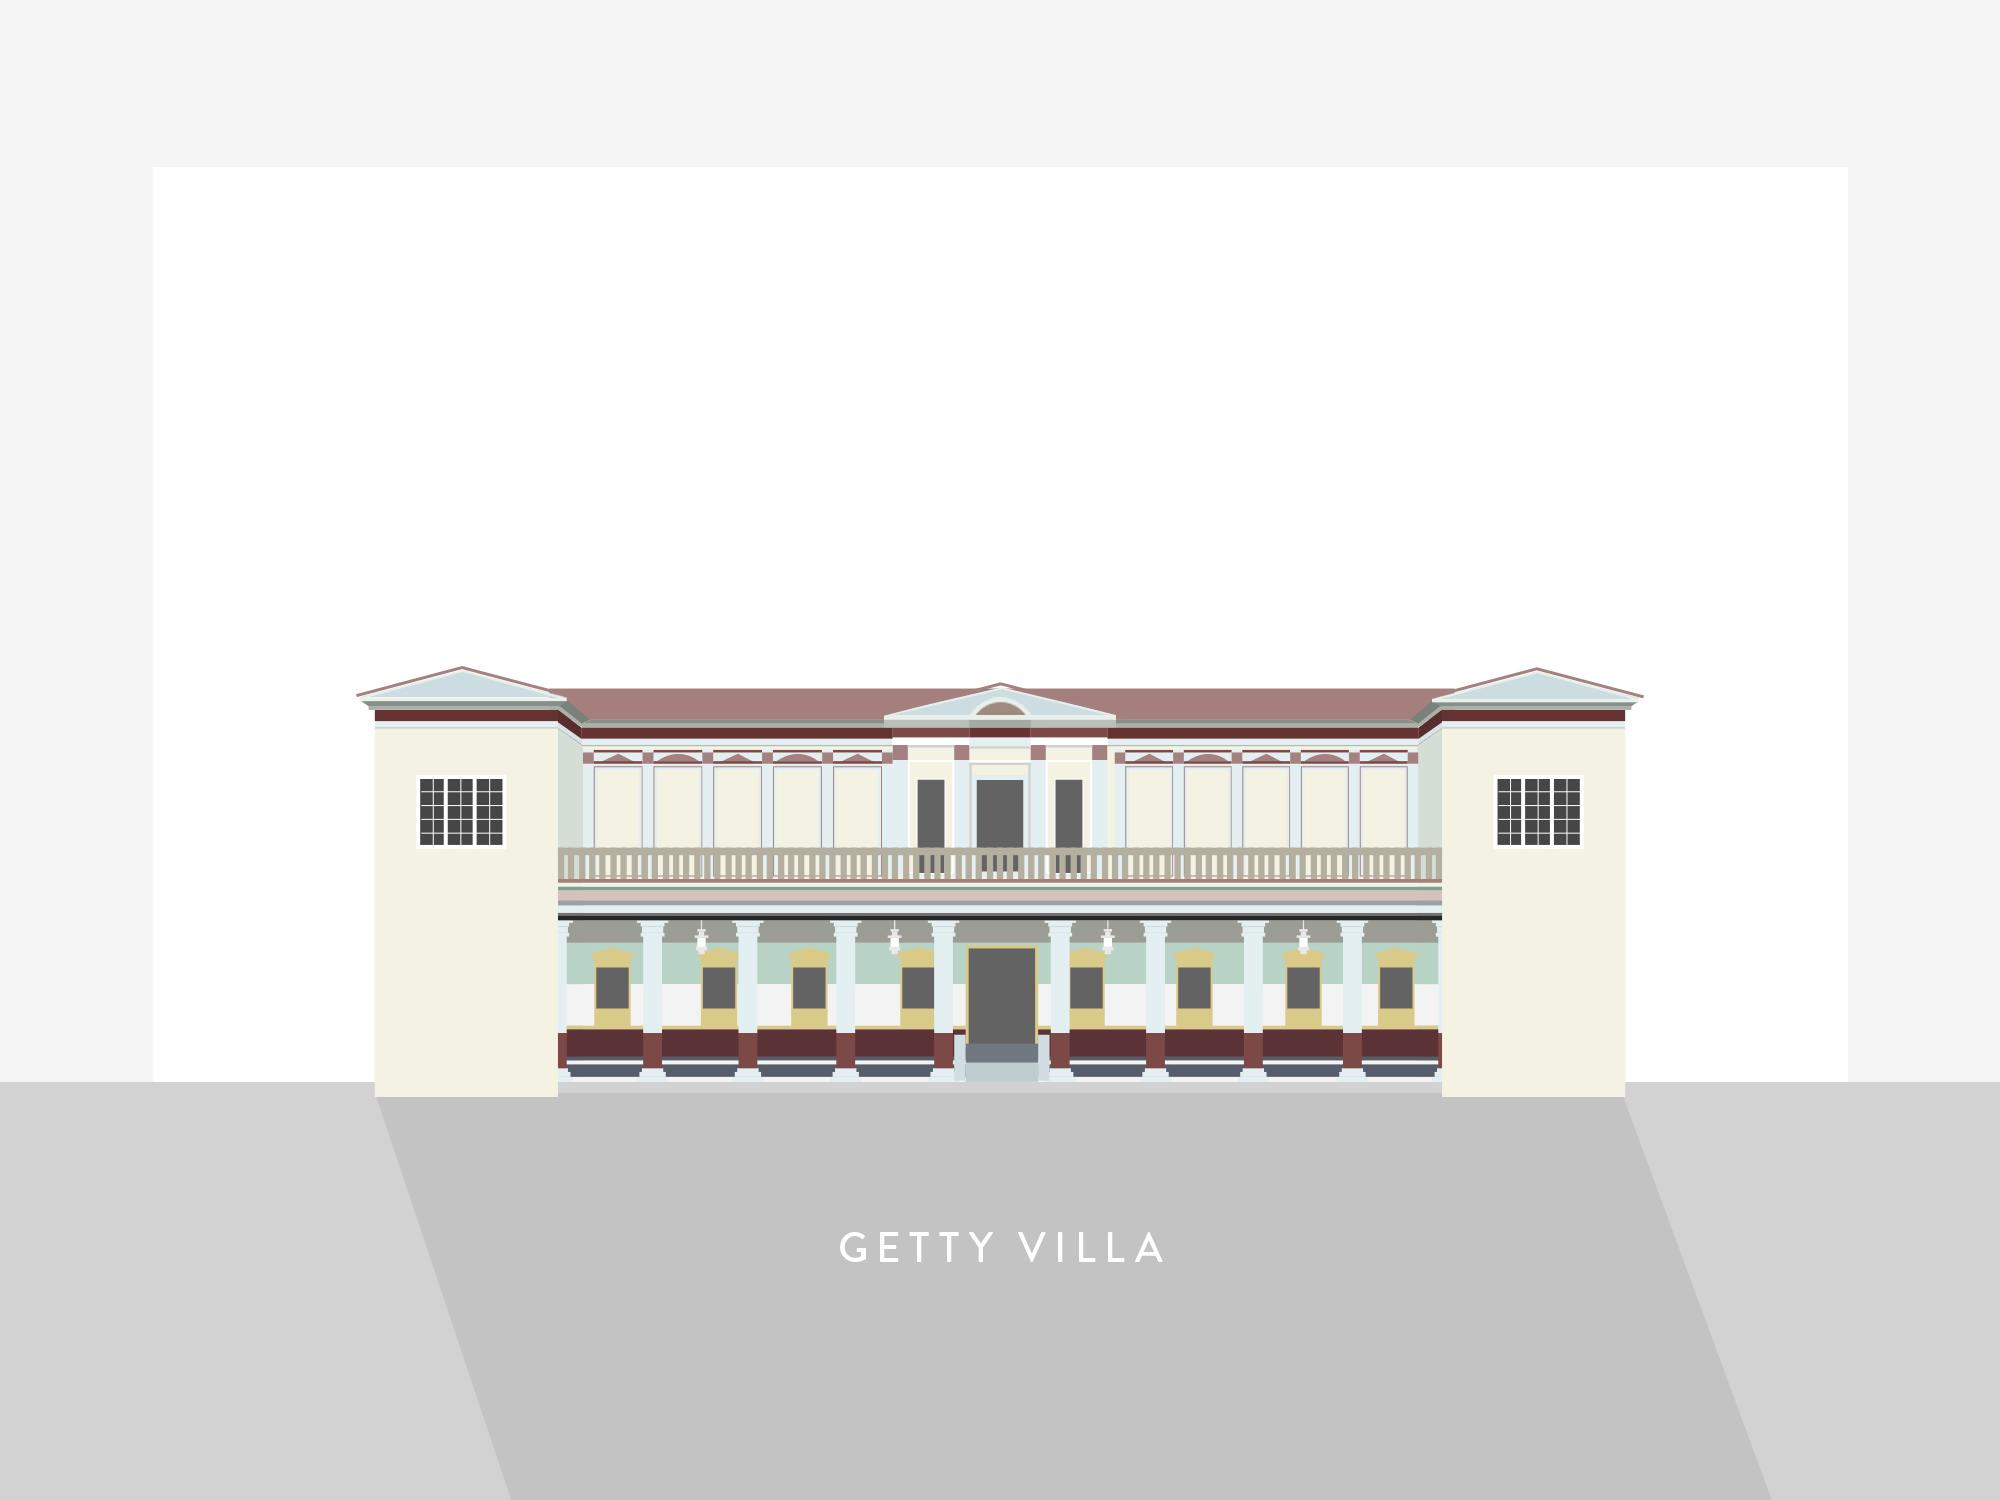 getty villa.jpg